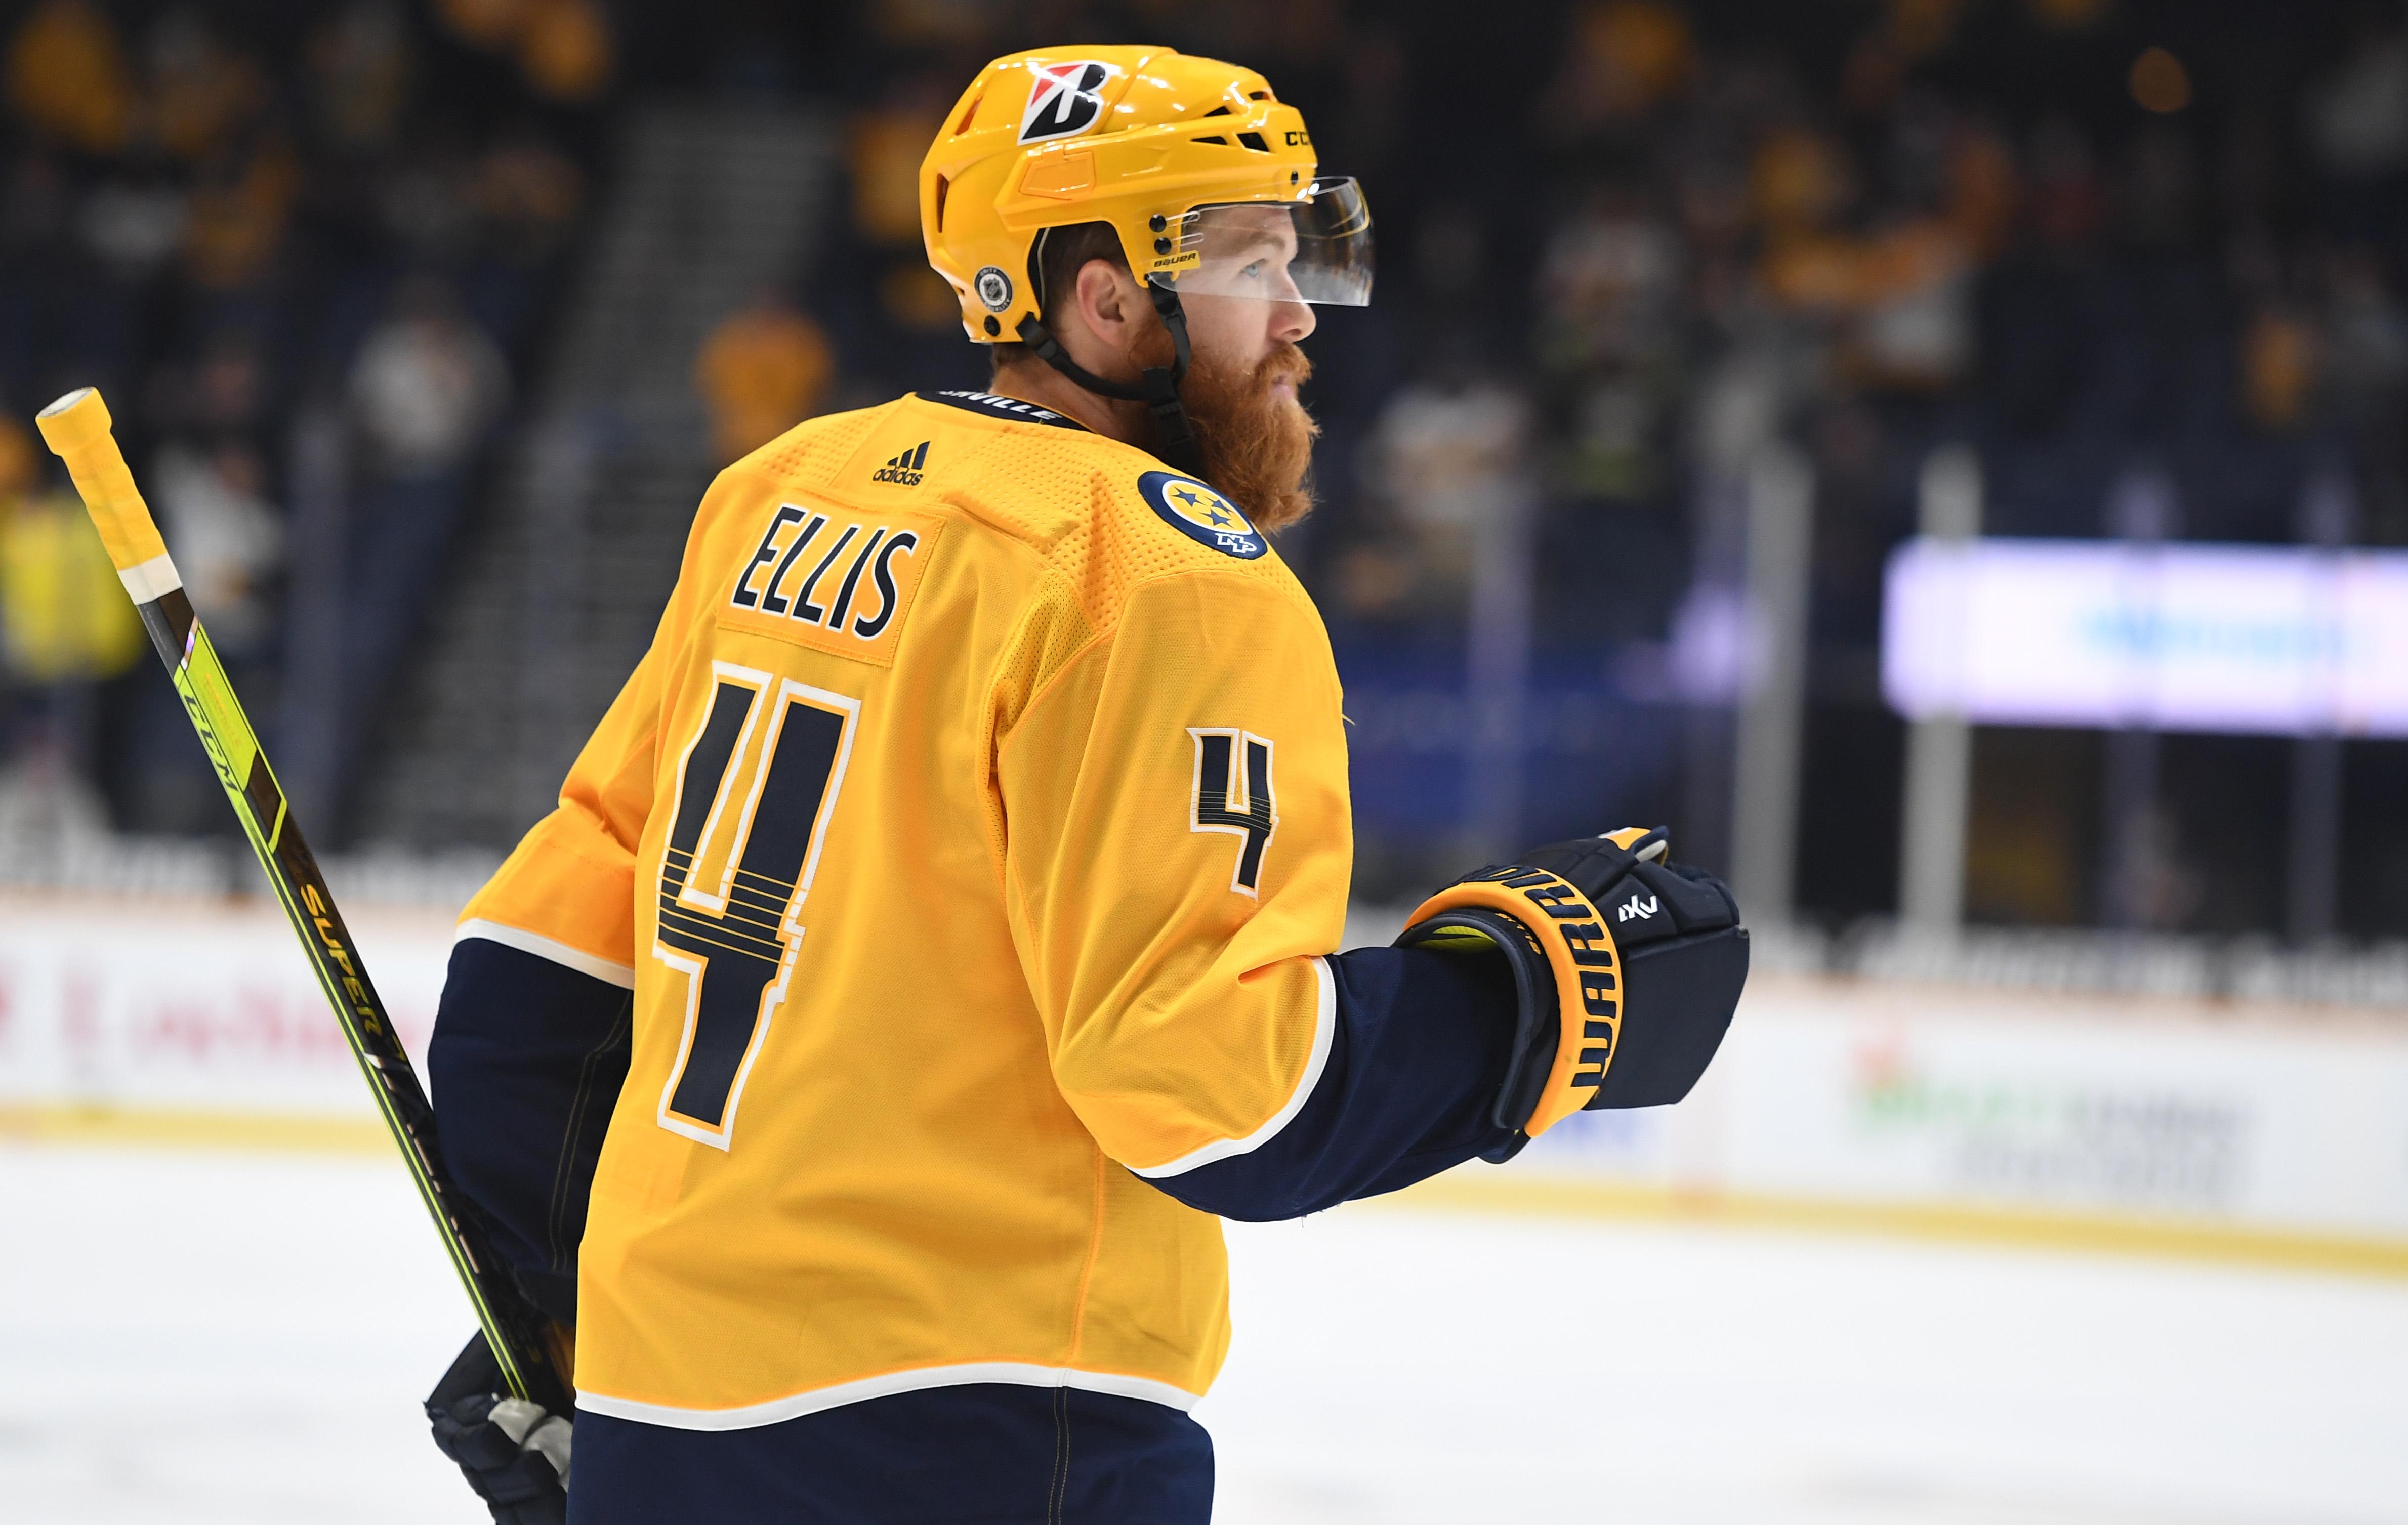 NHL: Florida Panthers at Nashville Predators